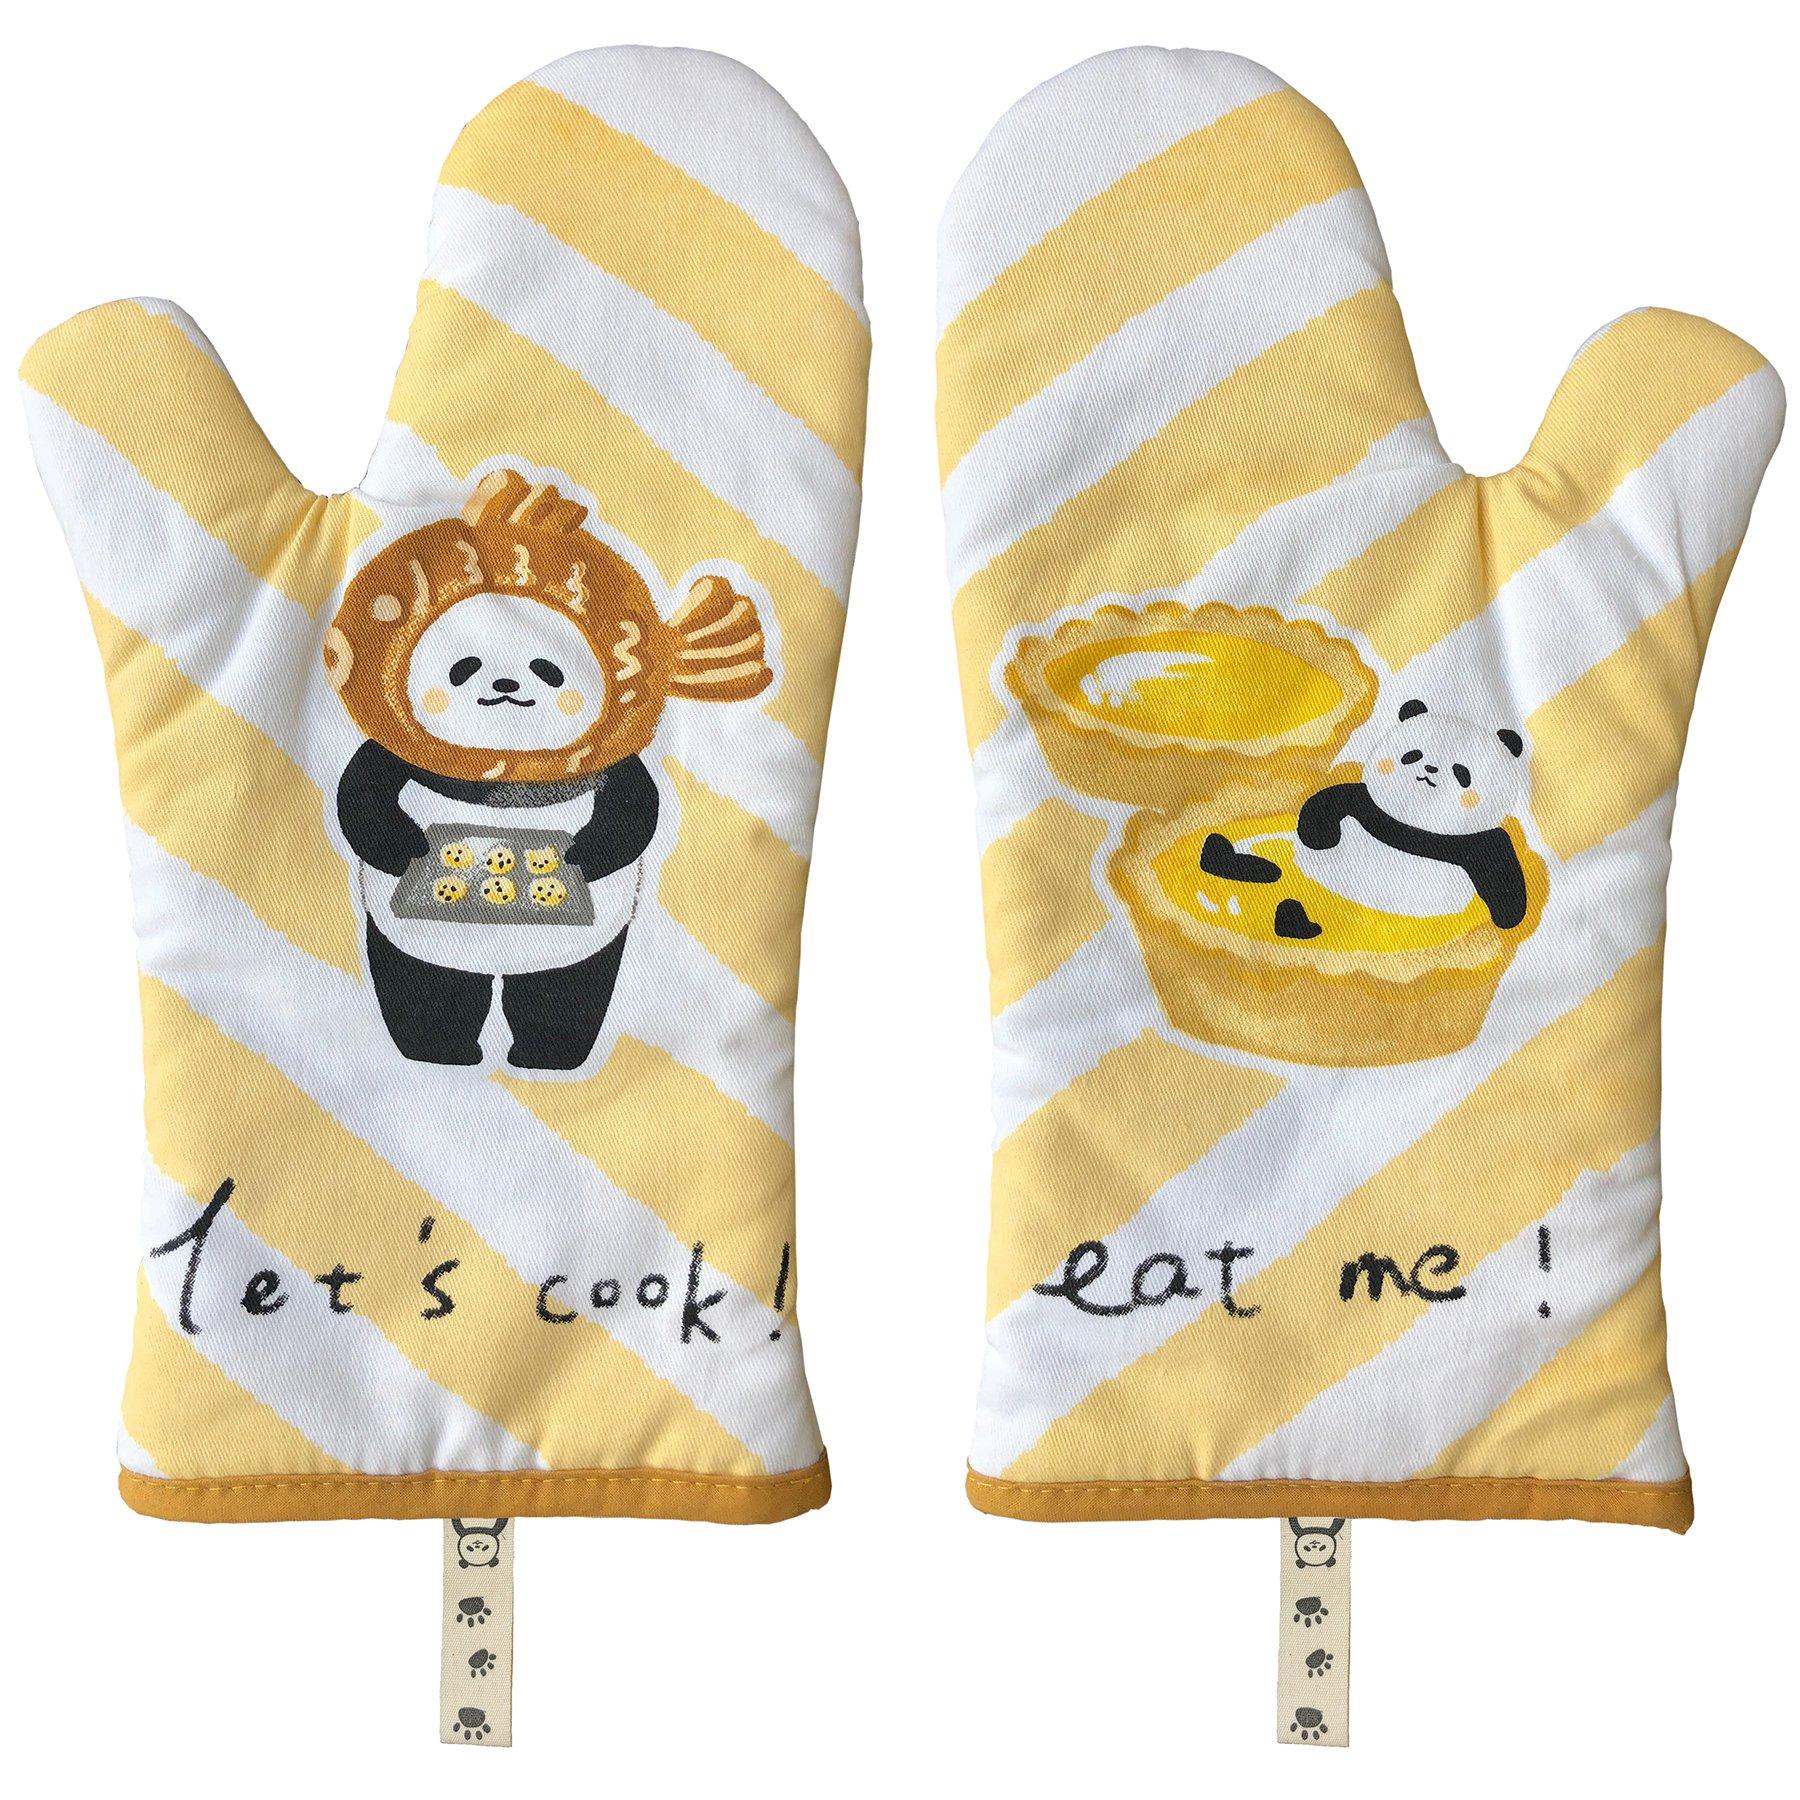 GREVY Oven Mitts Anti-Heat Kitchen Gloves 12'' Panda Bear Design Set of 2 (Pure Cotton Twill)